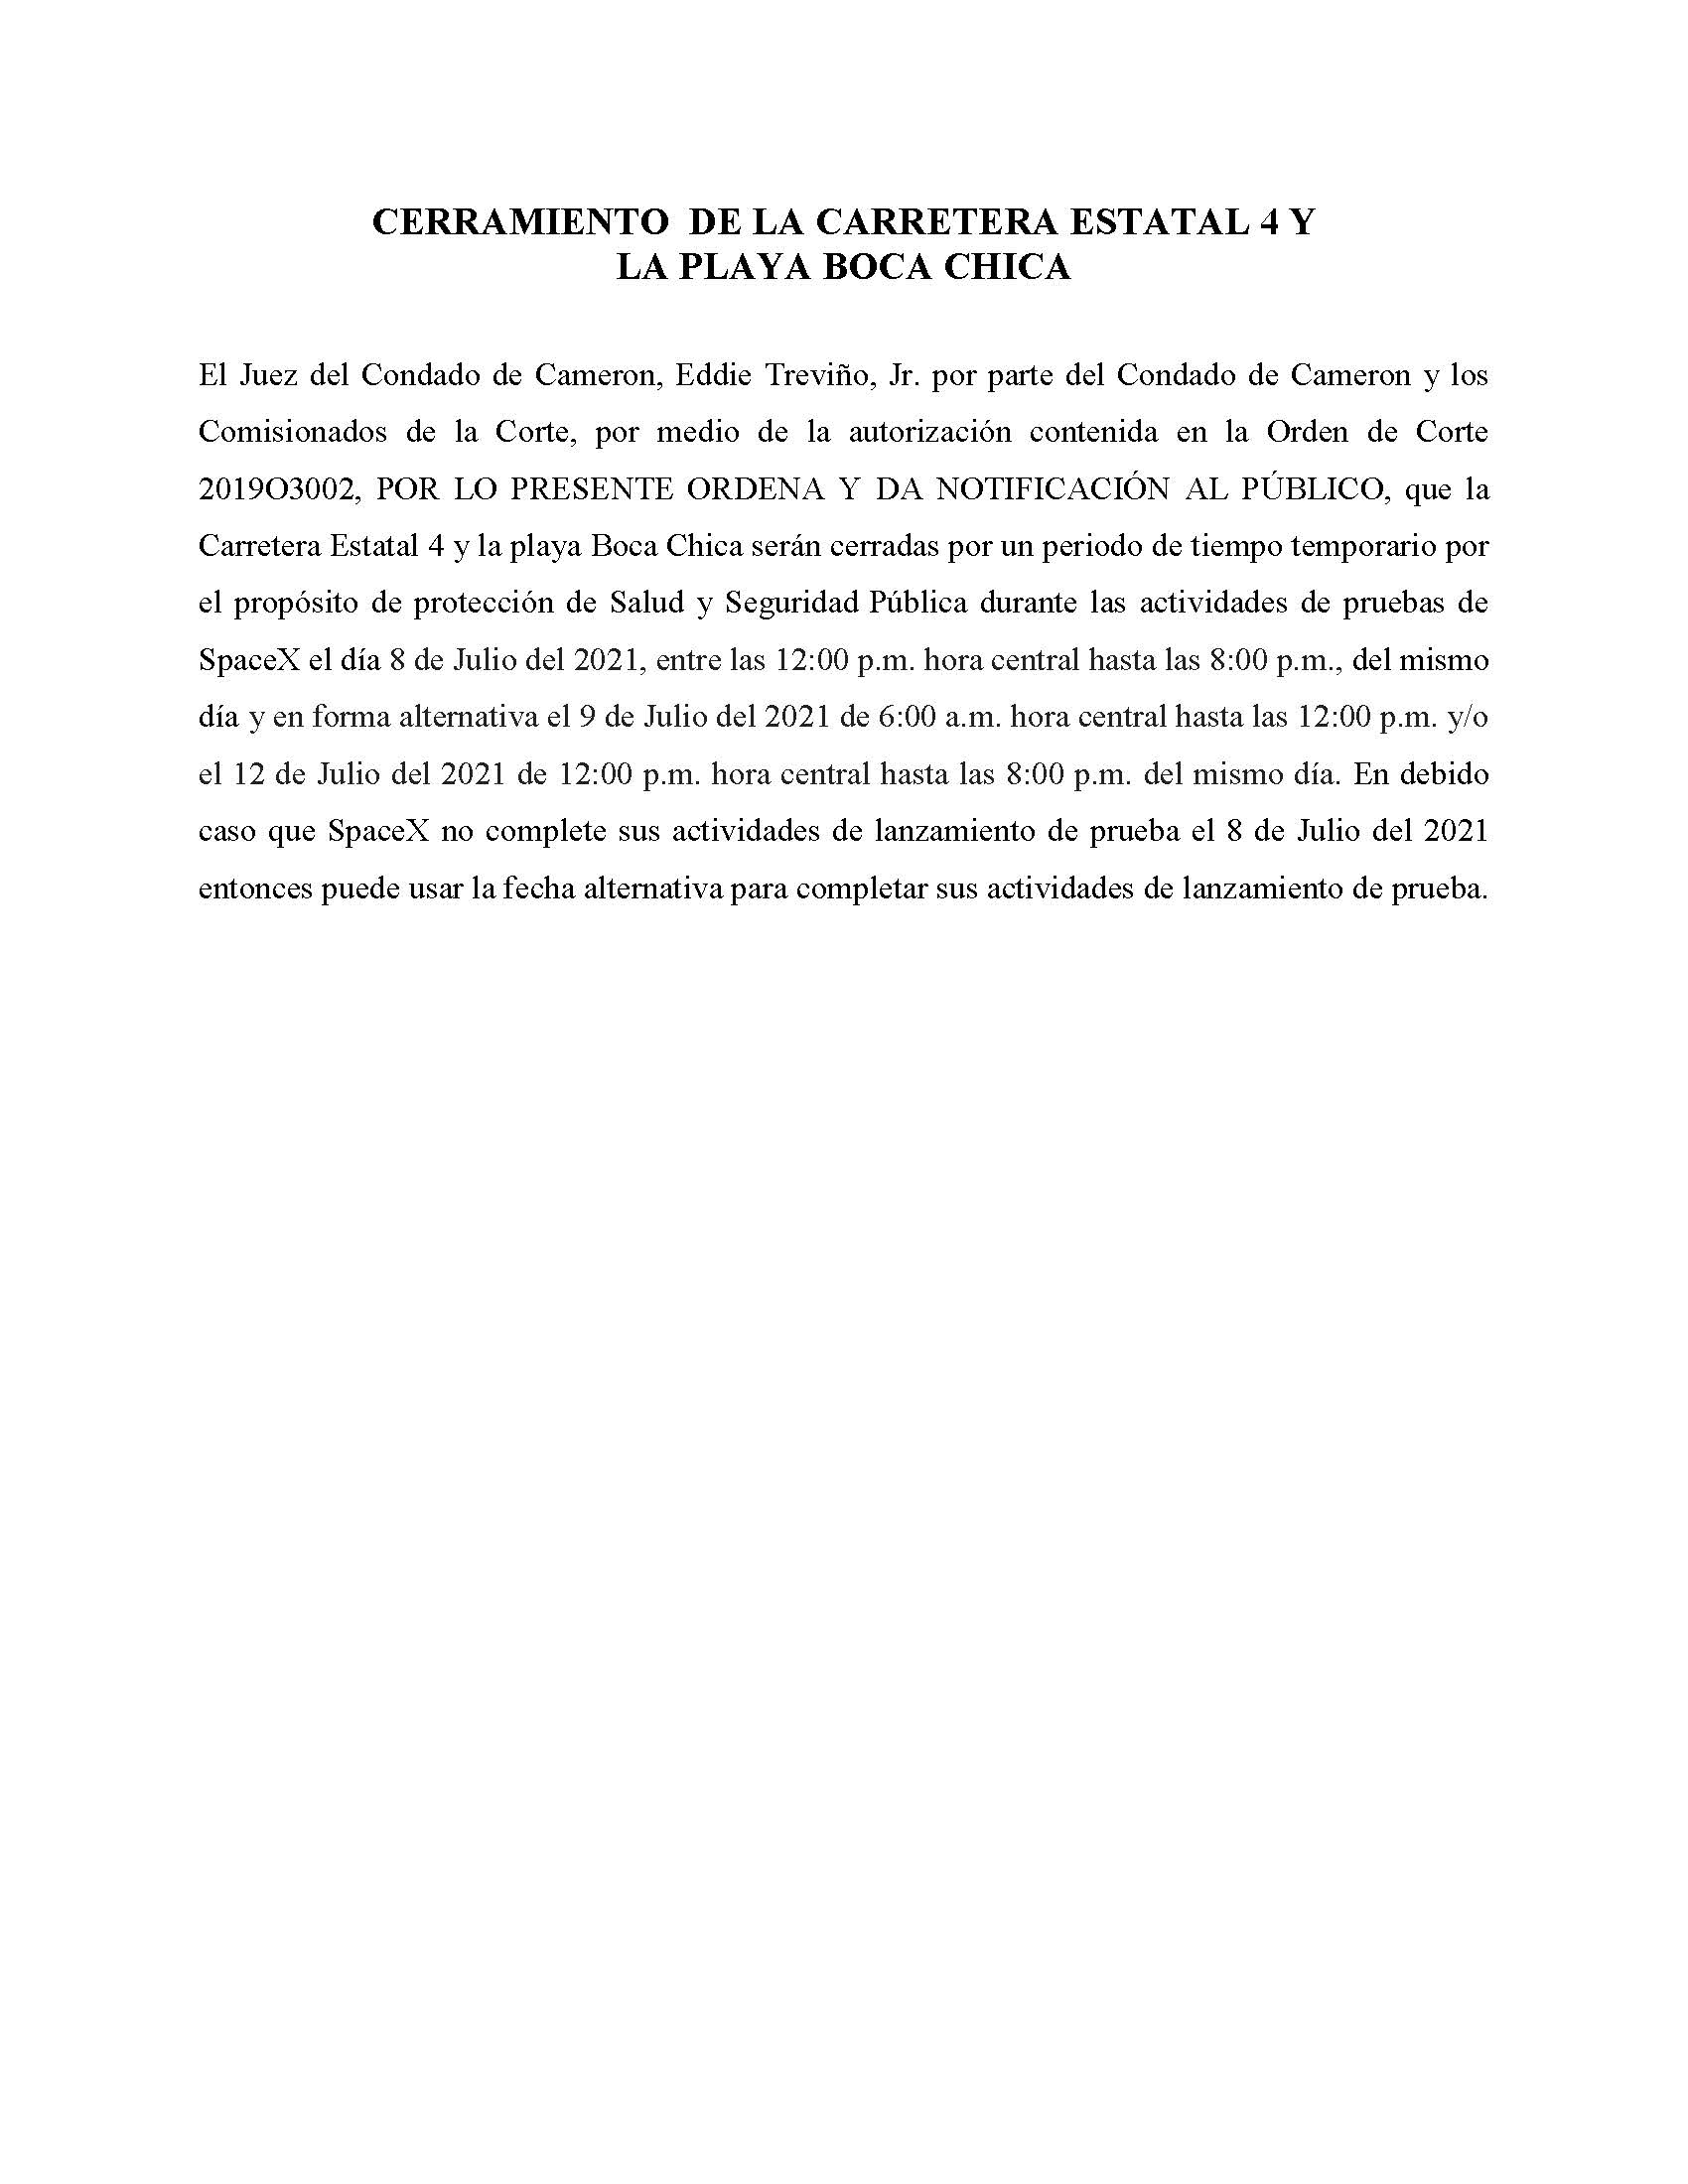 ORDER.CLOSURE OF HIGHWAY 4 Y LA PLAYA BOCA CHICA.SPANISH.07.08.2021